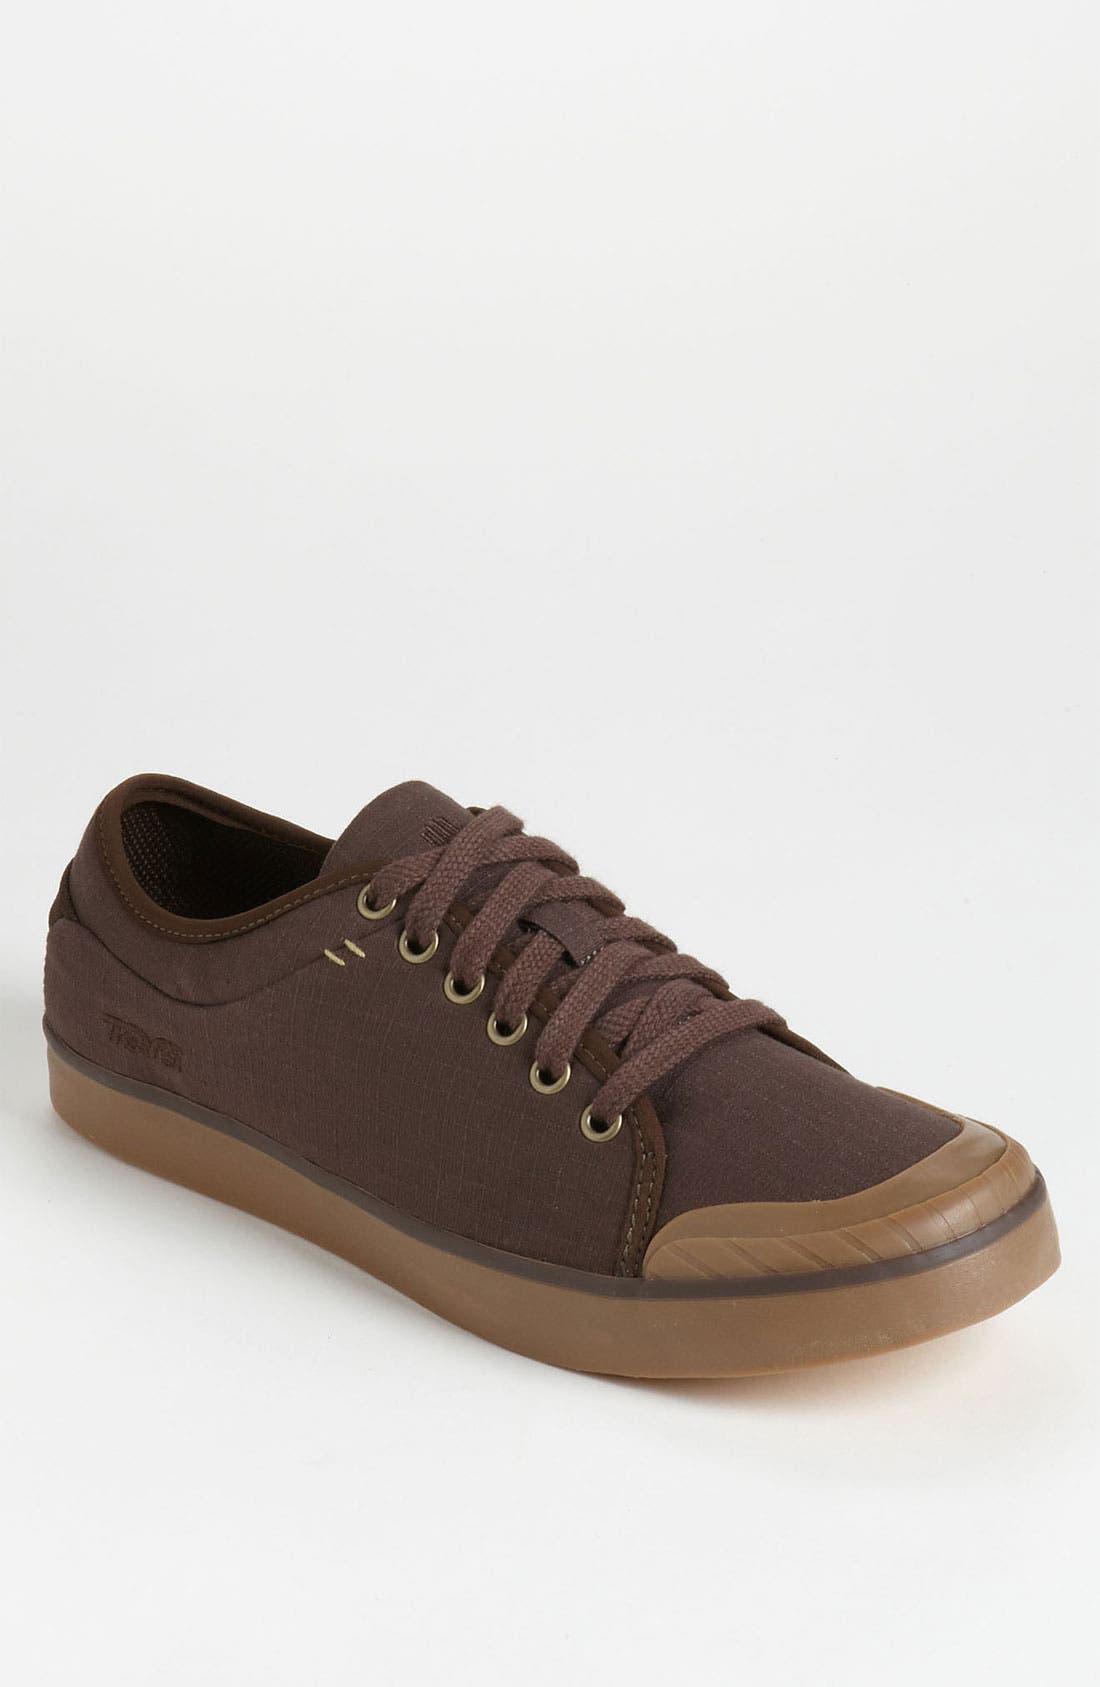 Alternate Image 1 Selected - Teva 'Joyride' Sneaker (Men)